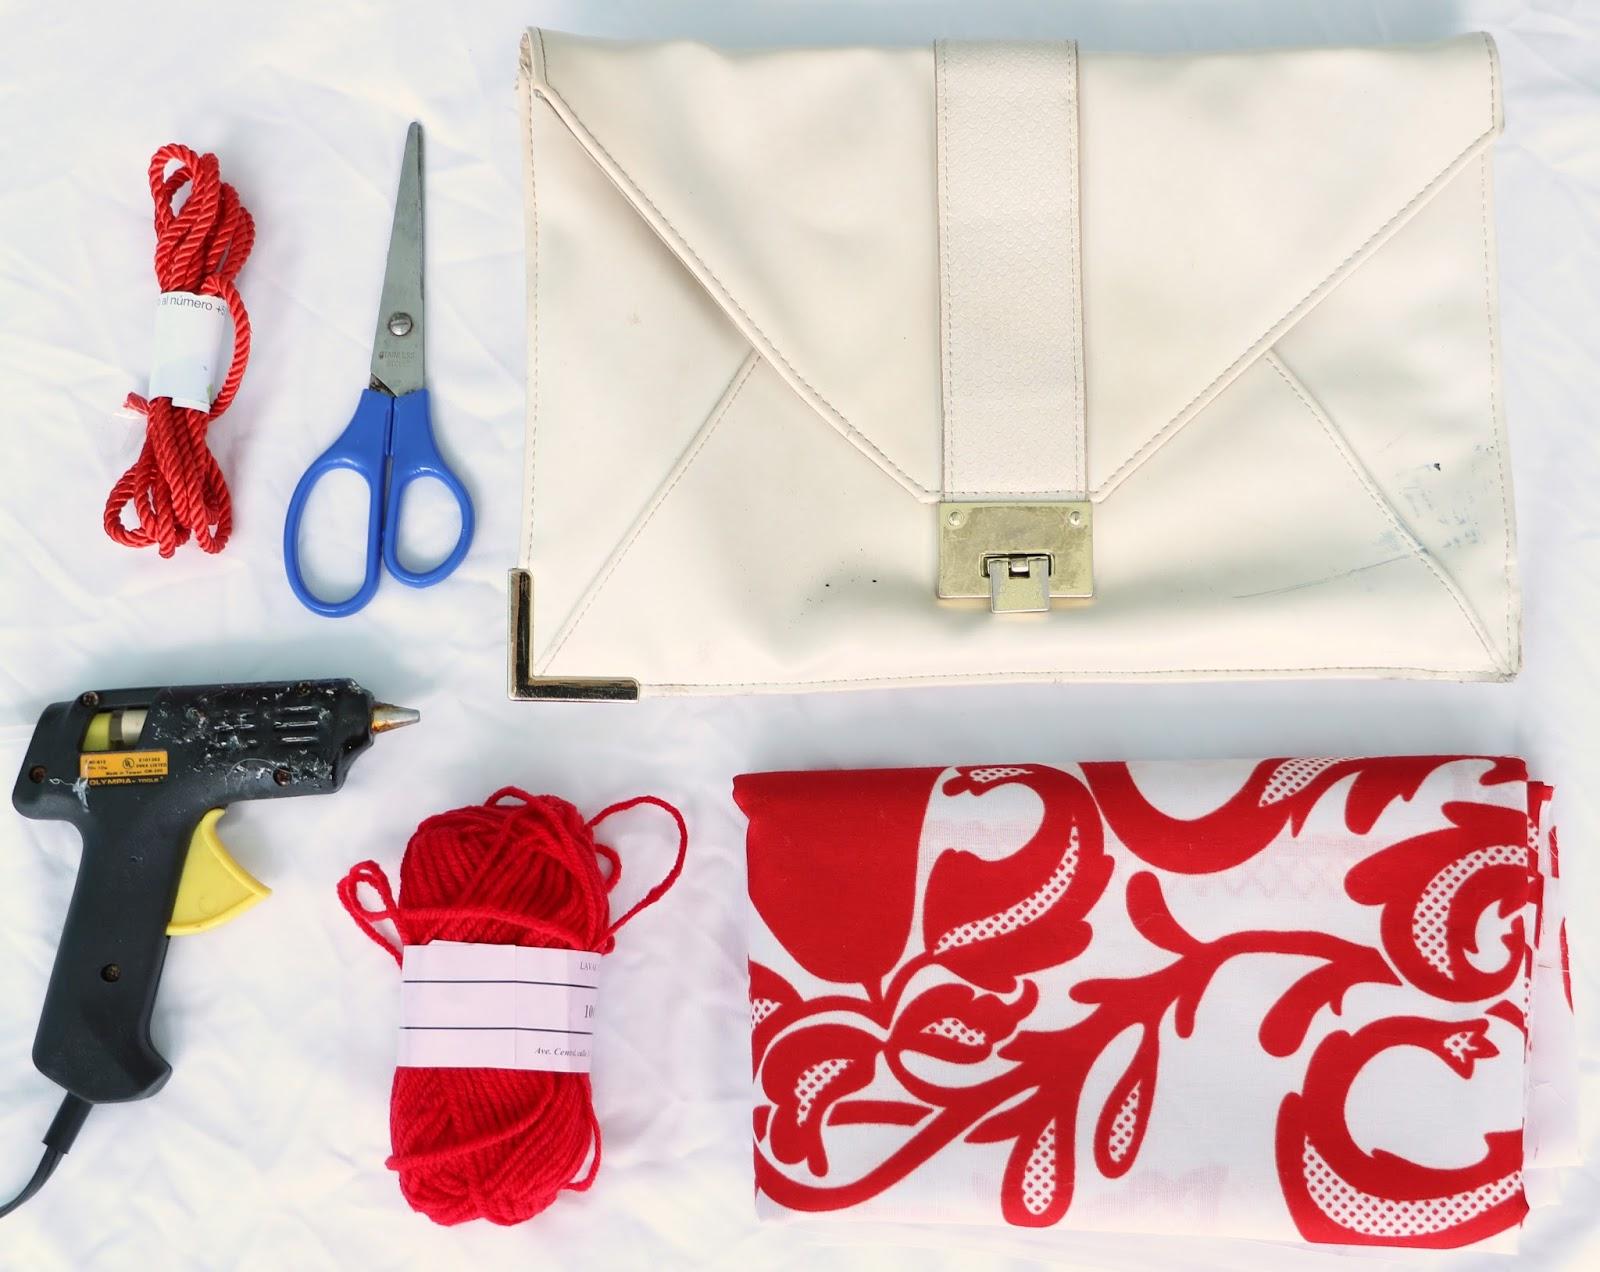 DIY No-Sew Panama pollera inspired clutch. Click through for tutorial